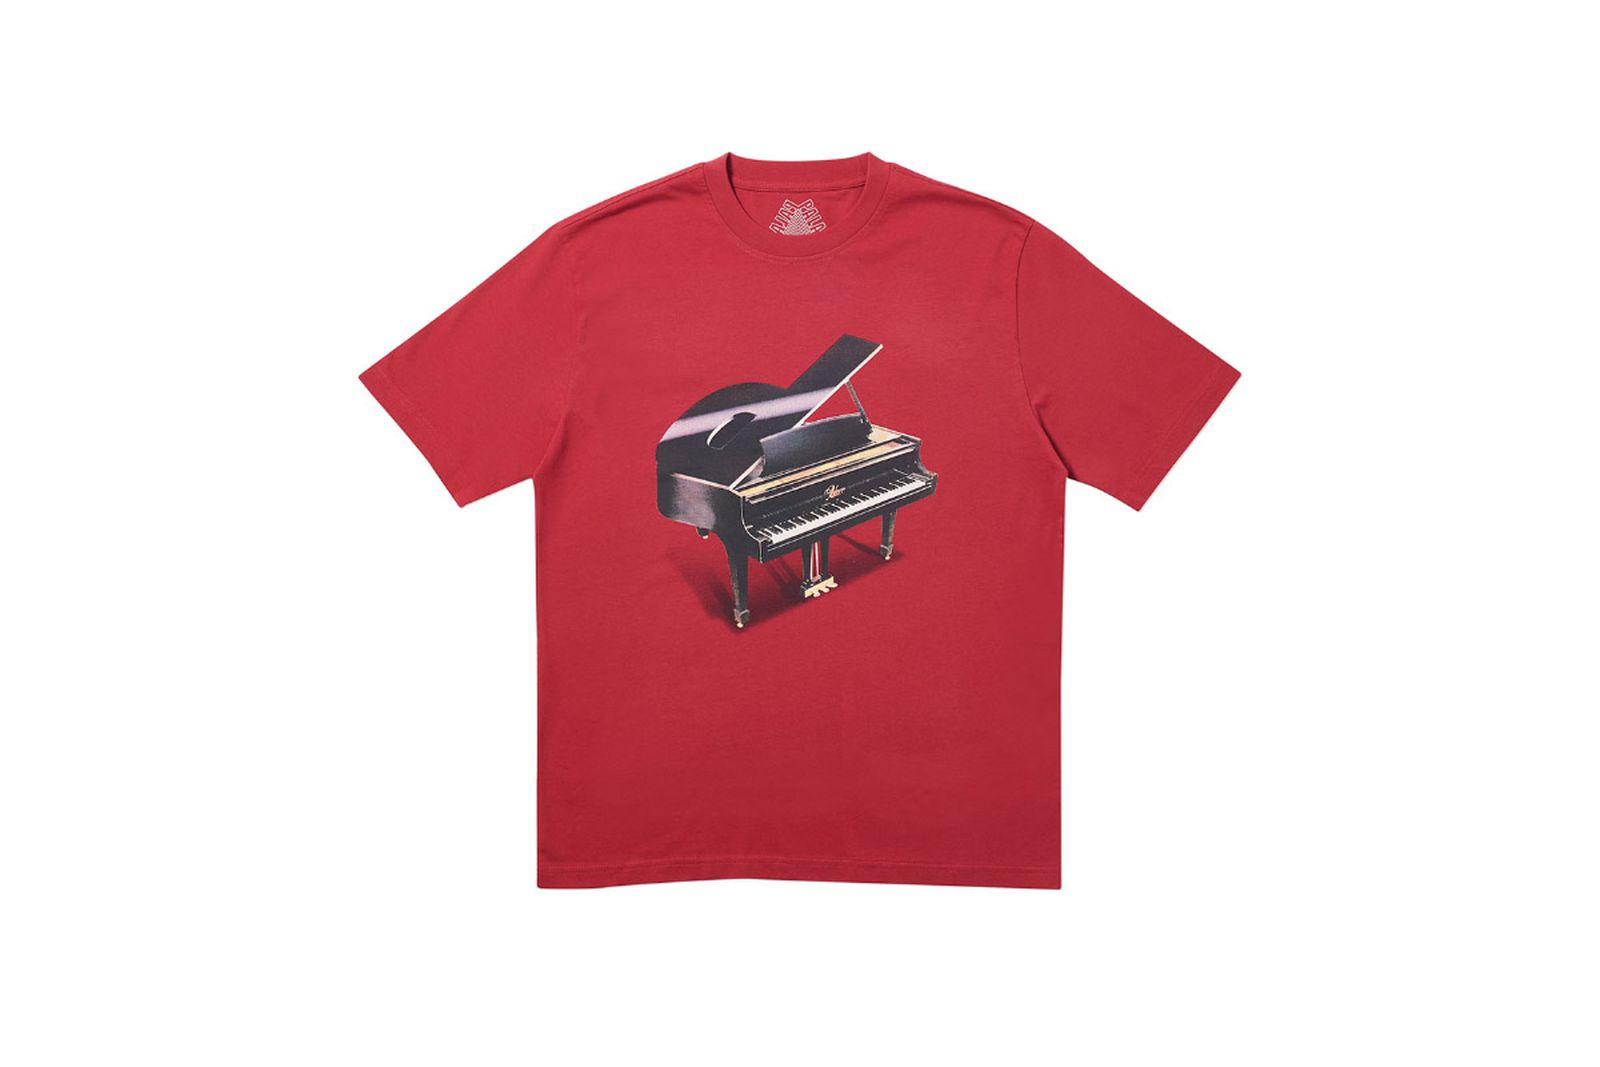 Palace 2019 Autumn T Shirt Grand dark red